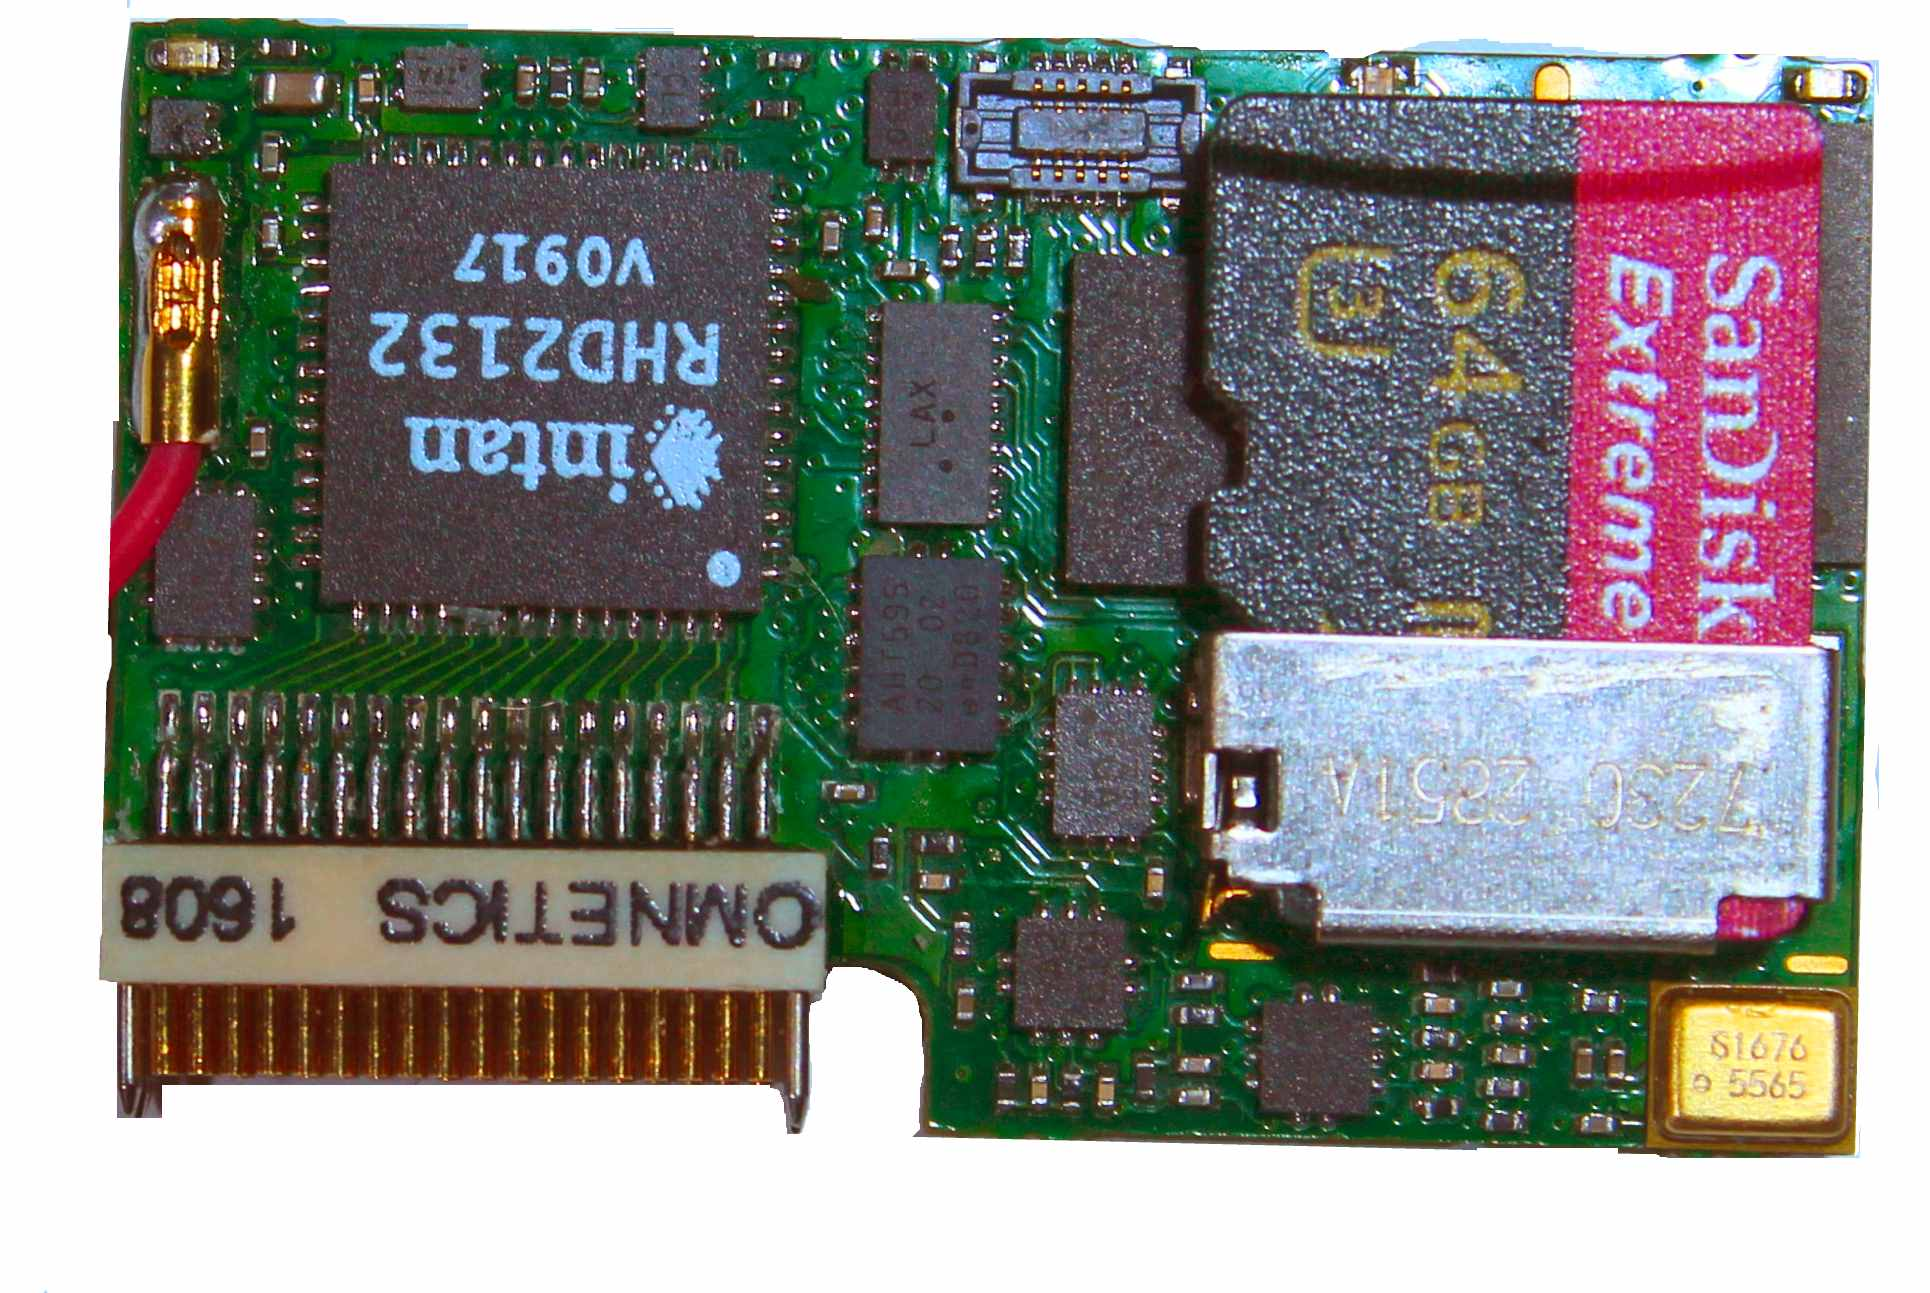 Ultrasonic Sensor Group Control Update 32 Sensors At Once